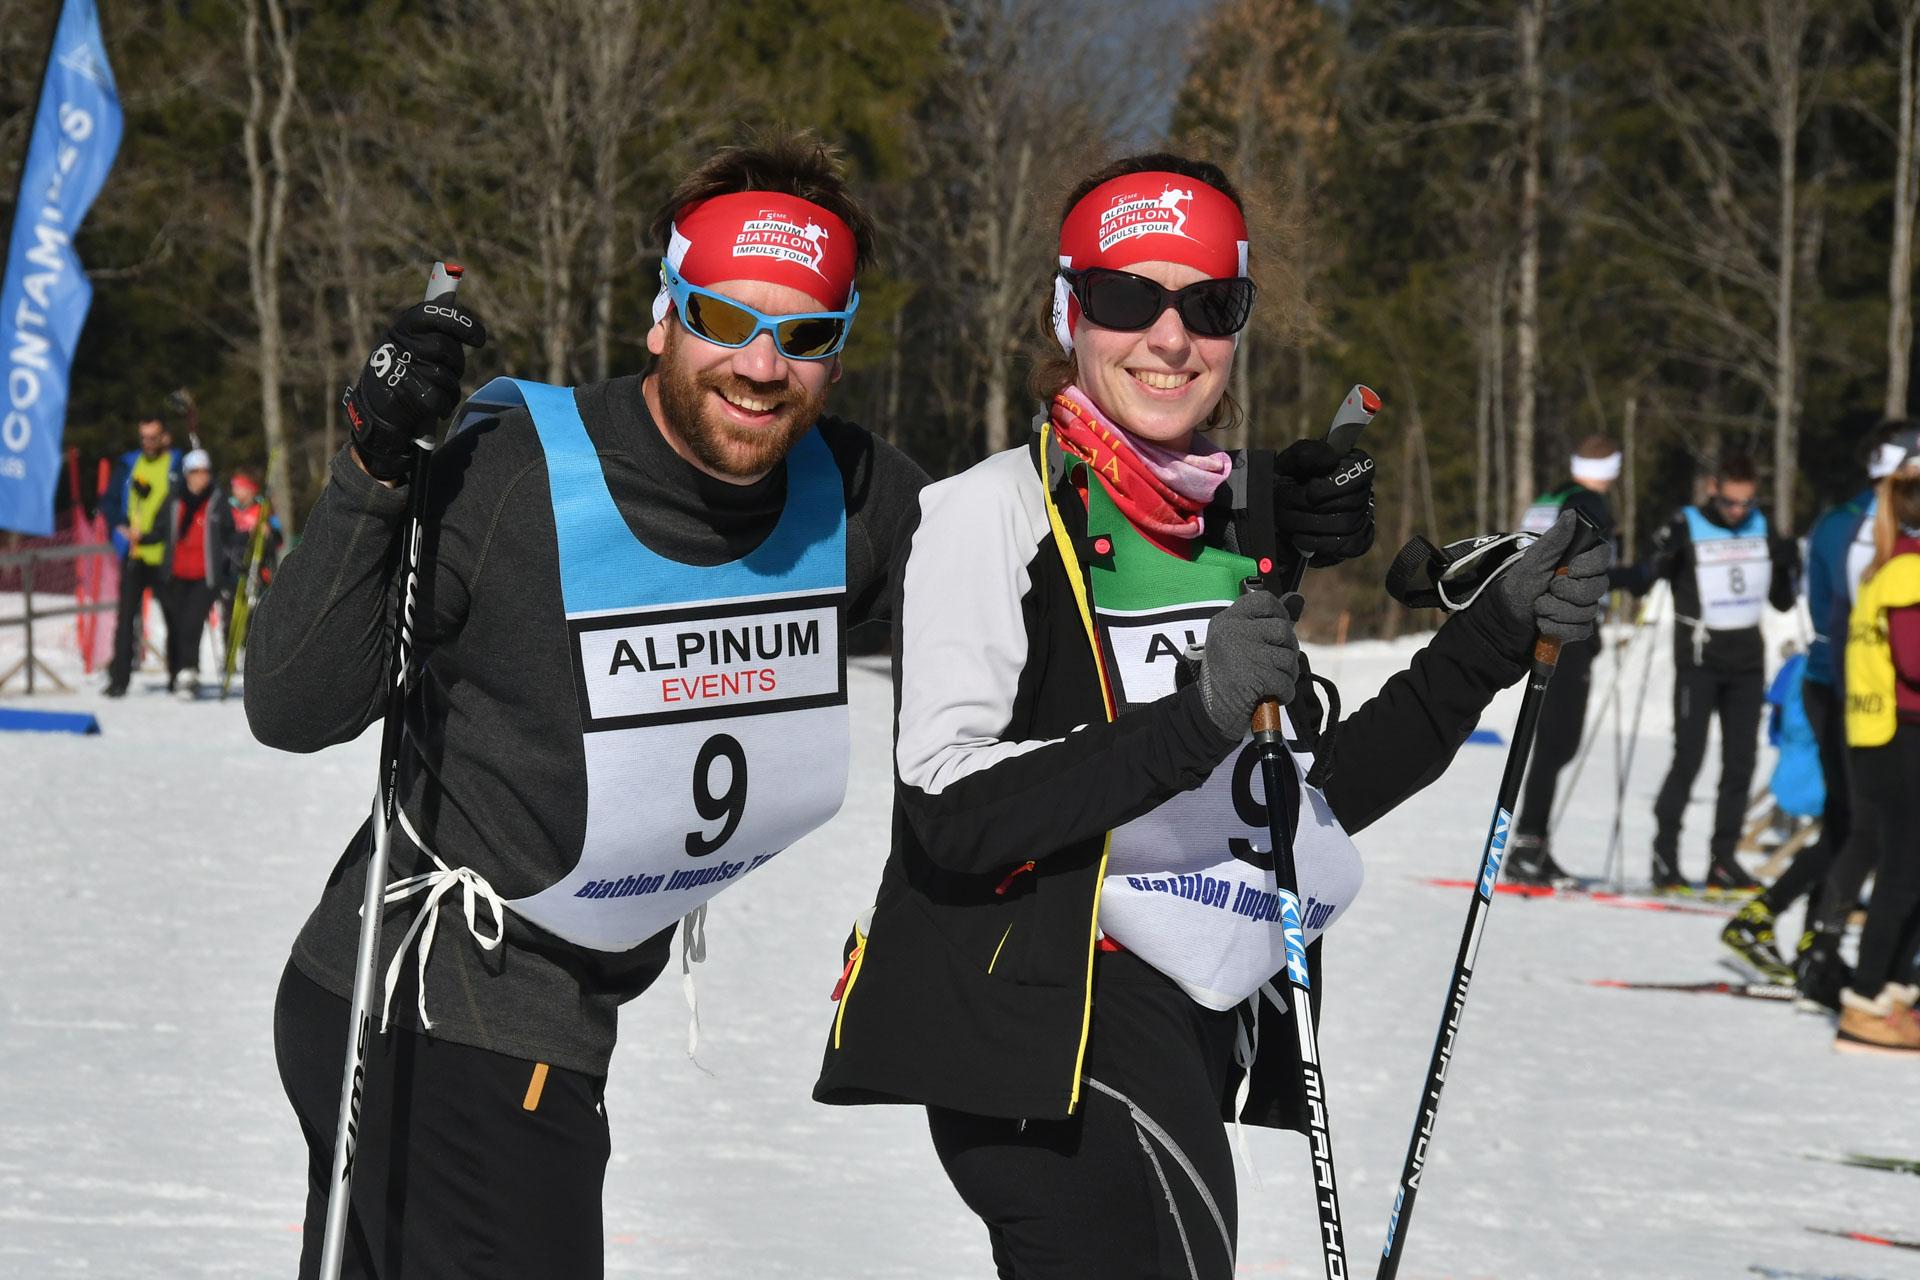 Alpinum-Biathlon-Impulse-Tour-2019©JulieRuly_220